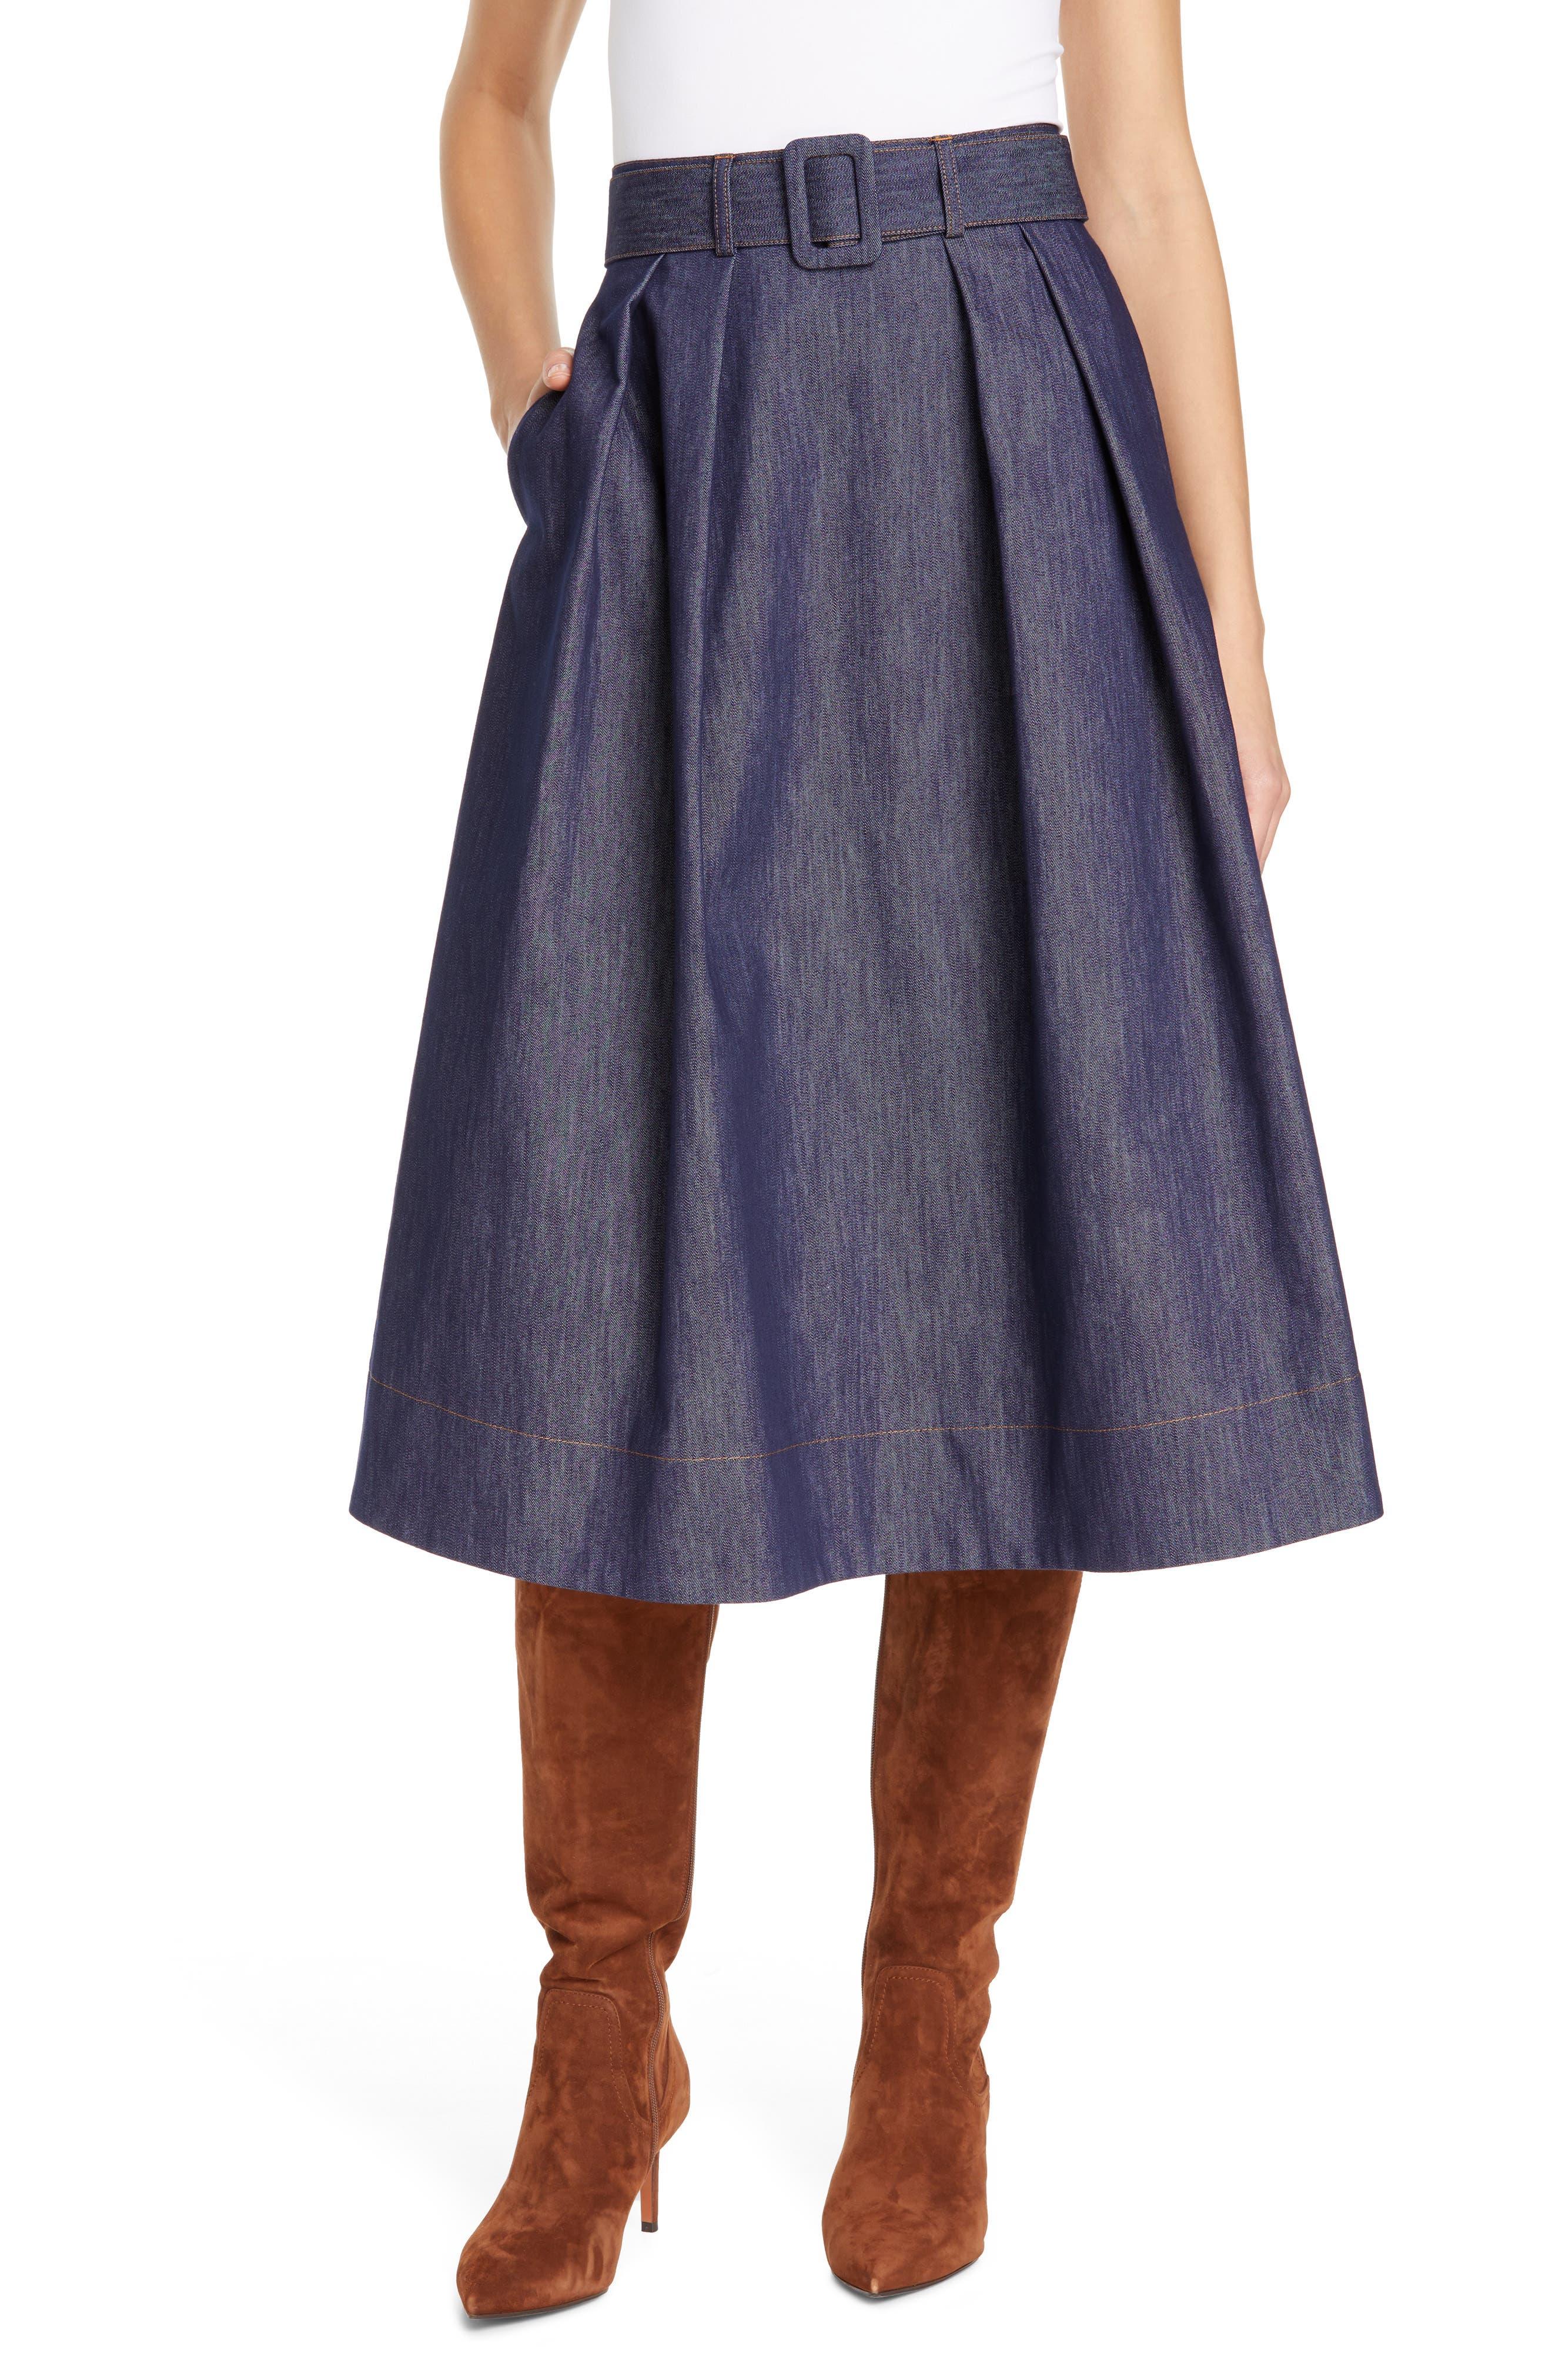 TOMMY X ZENDAYA, Belted Denim Skirt, Main thumbnail 1, color, 402